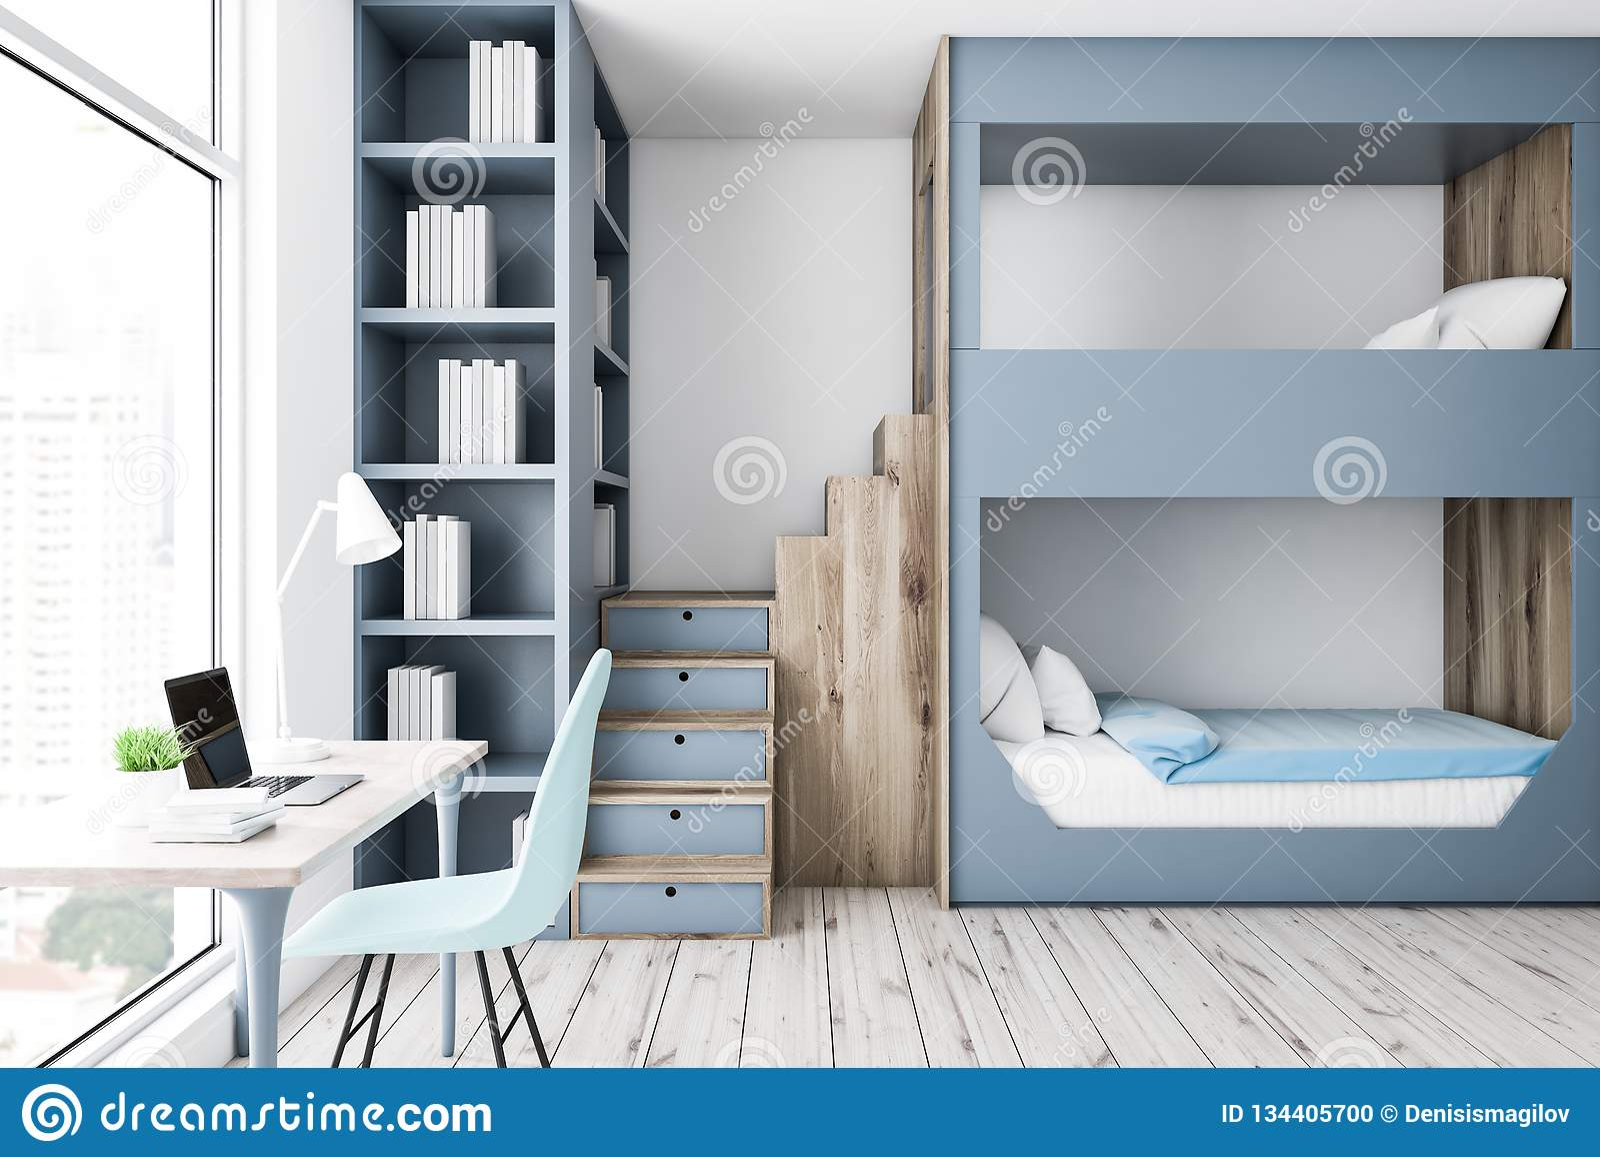 Gray Bunk Bed Bedroom Interior Computer Desk Stock